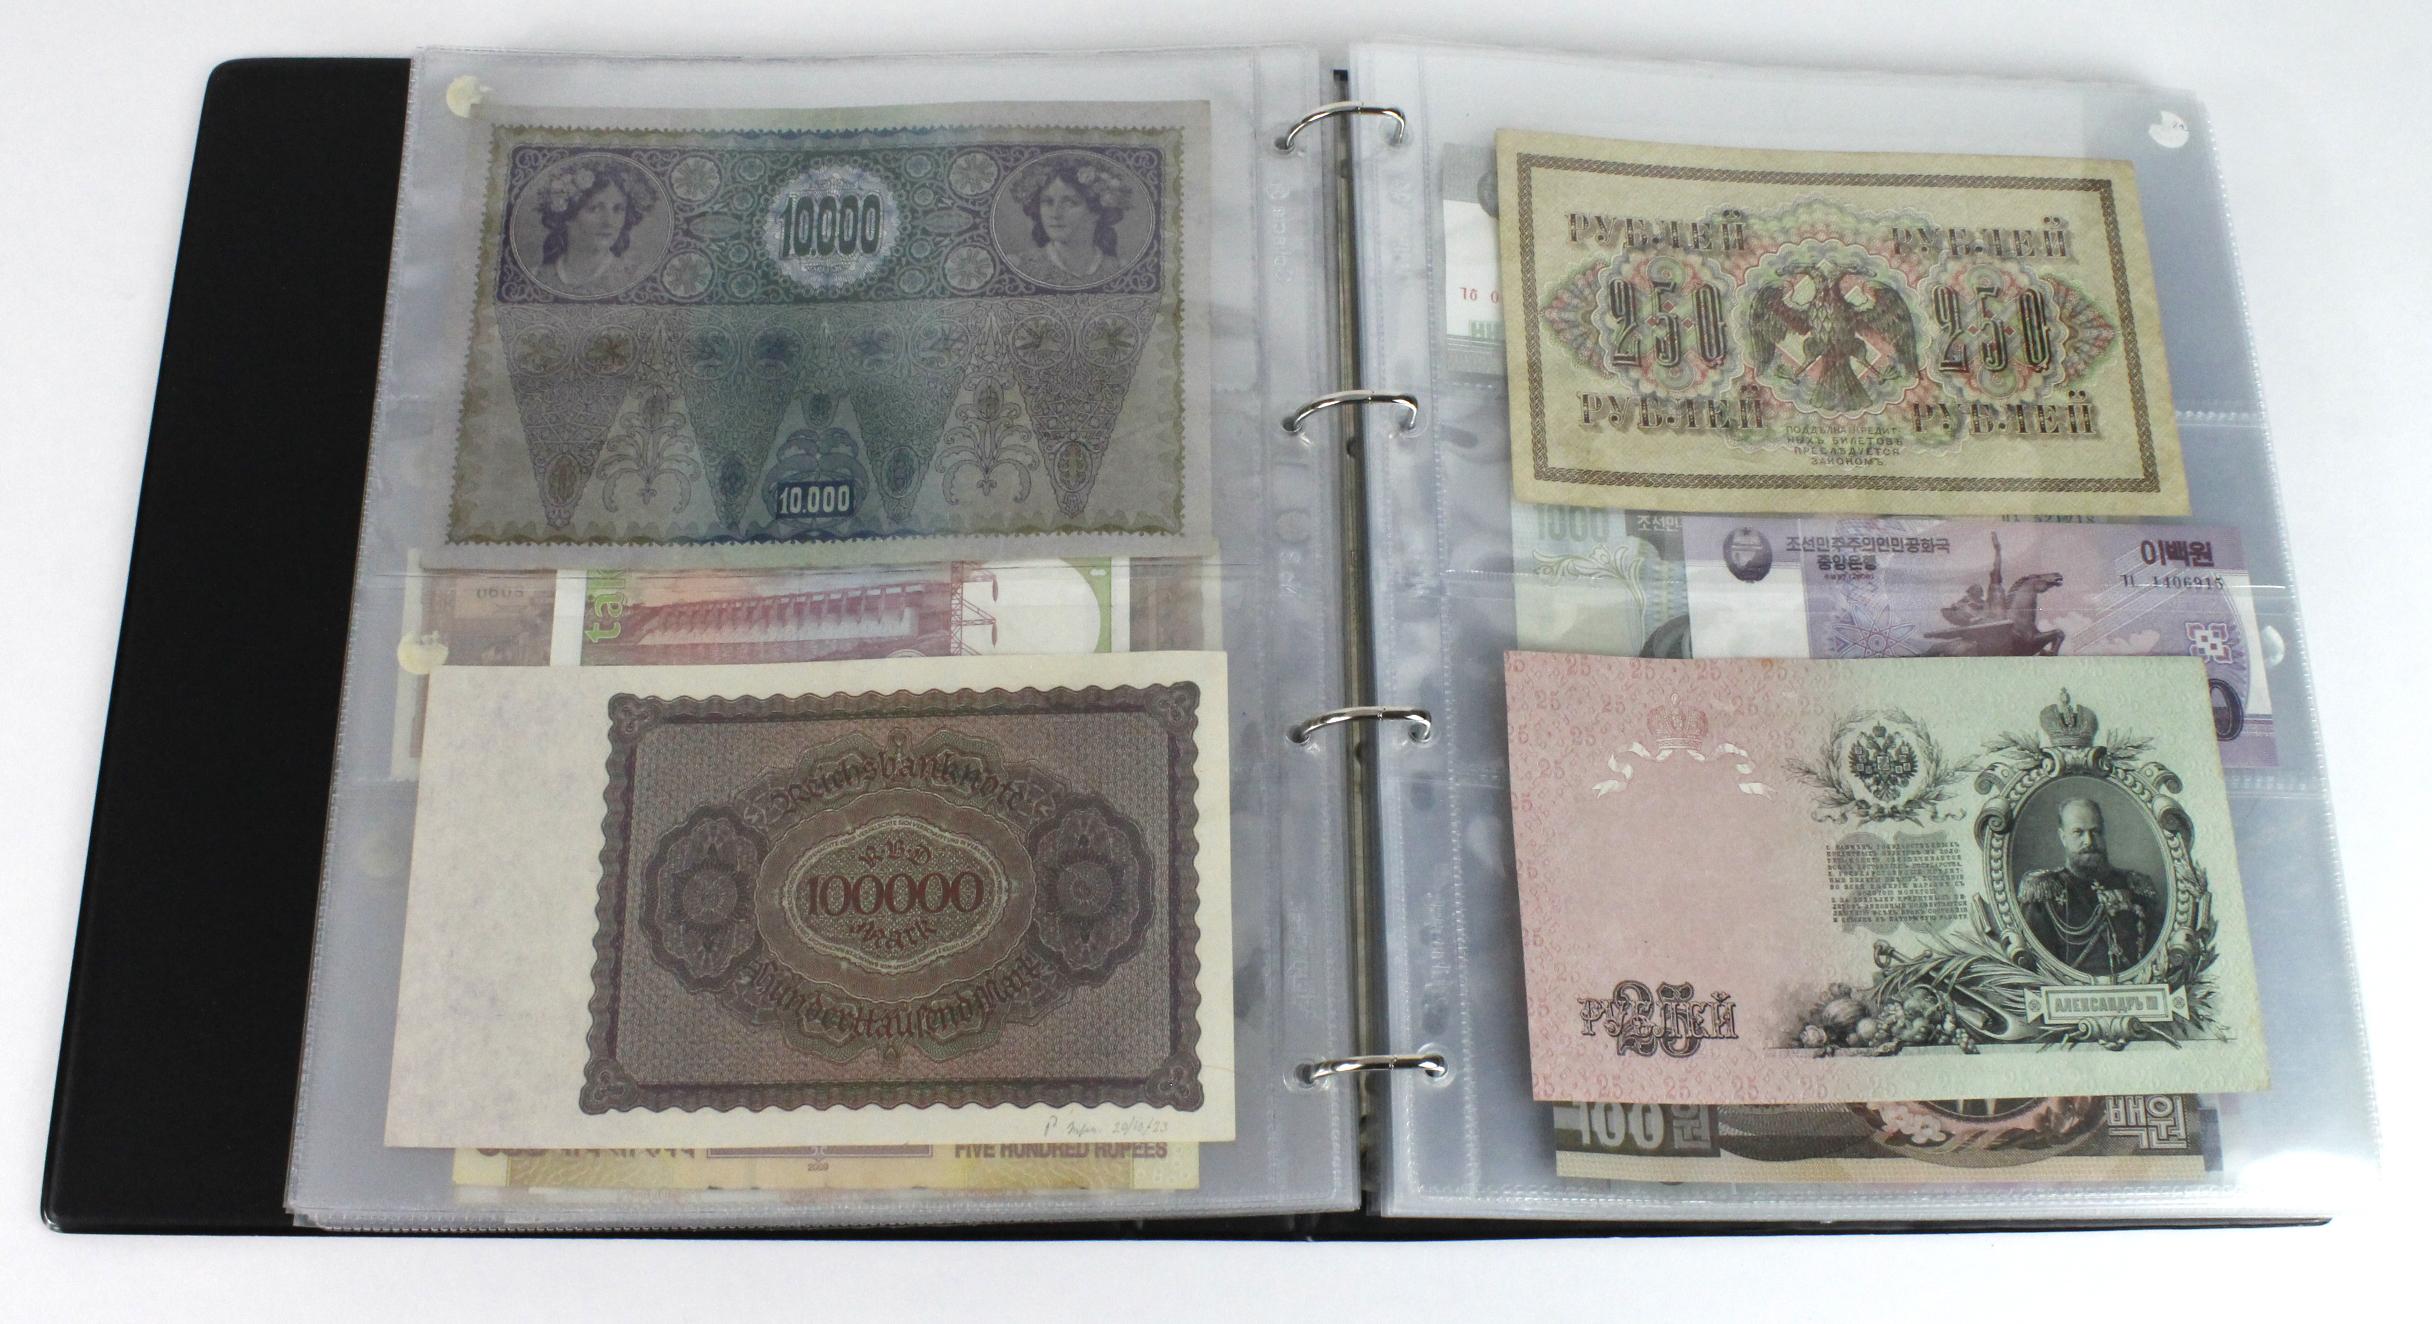 World (163), in banknote album including Bahamas, Spain, Sweden, Netherlands, Algeria, Macau, - Image 22 of 57